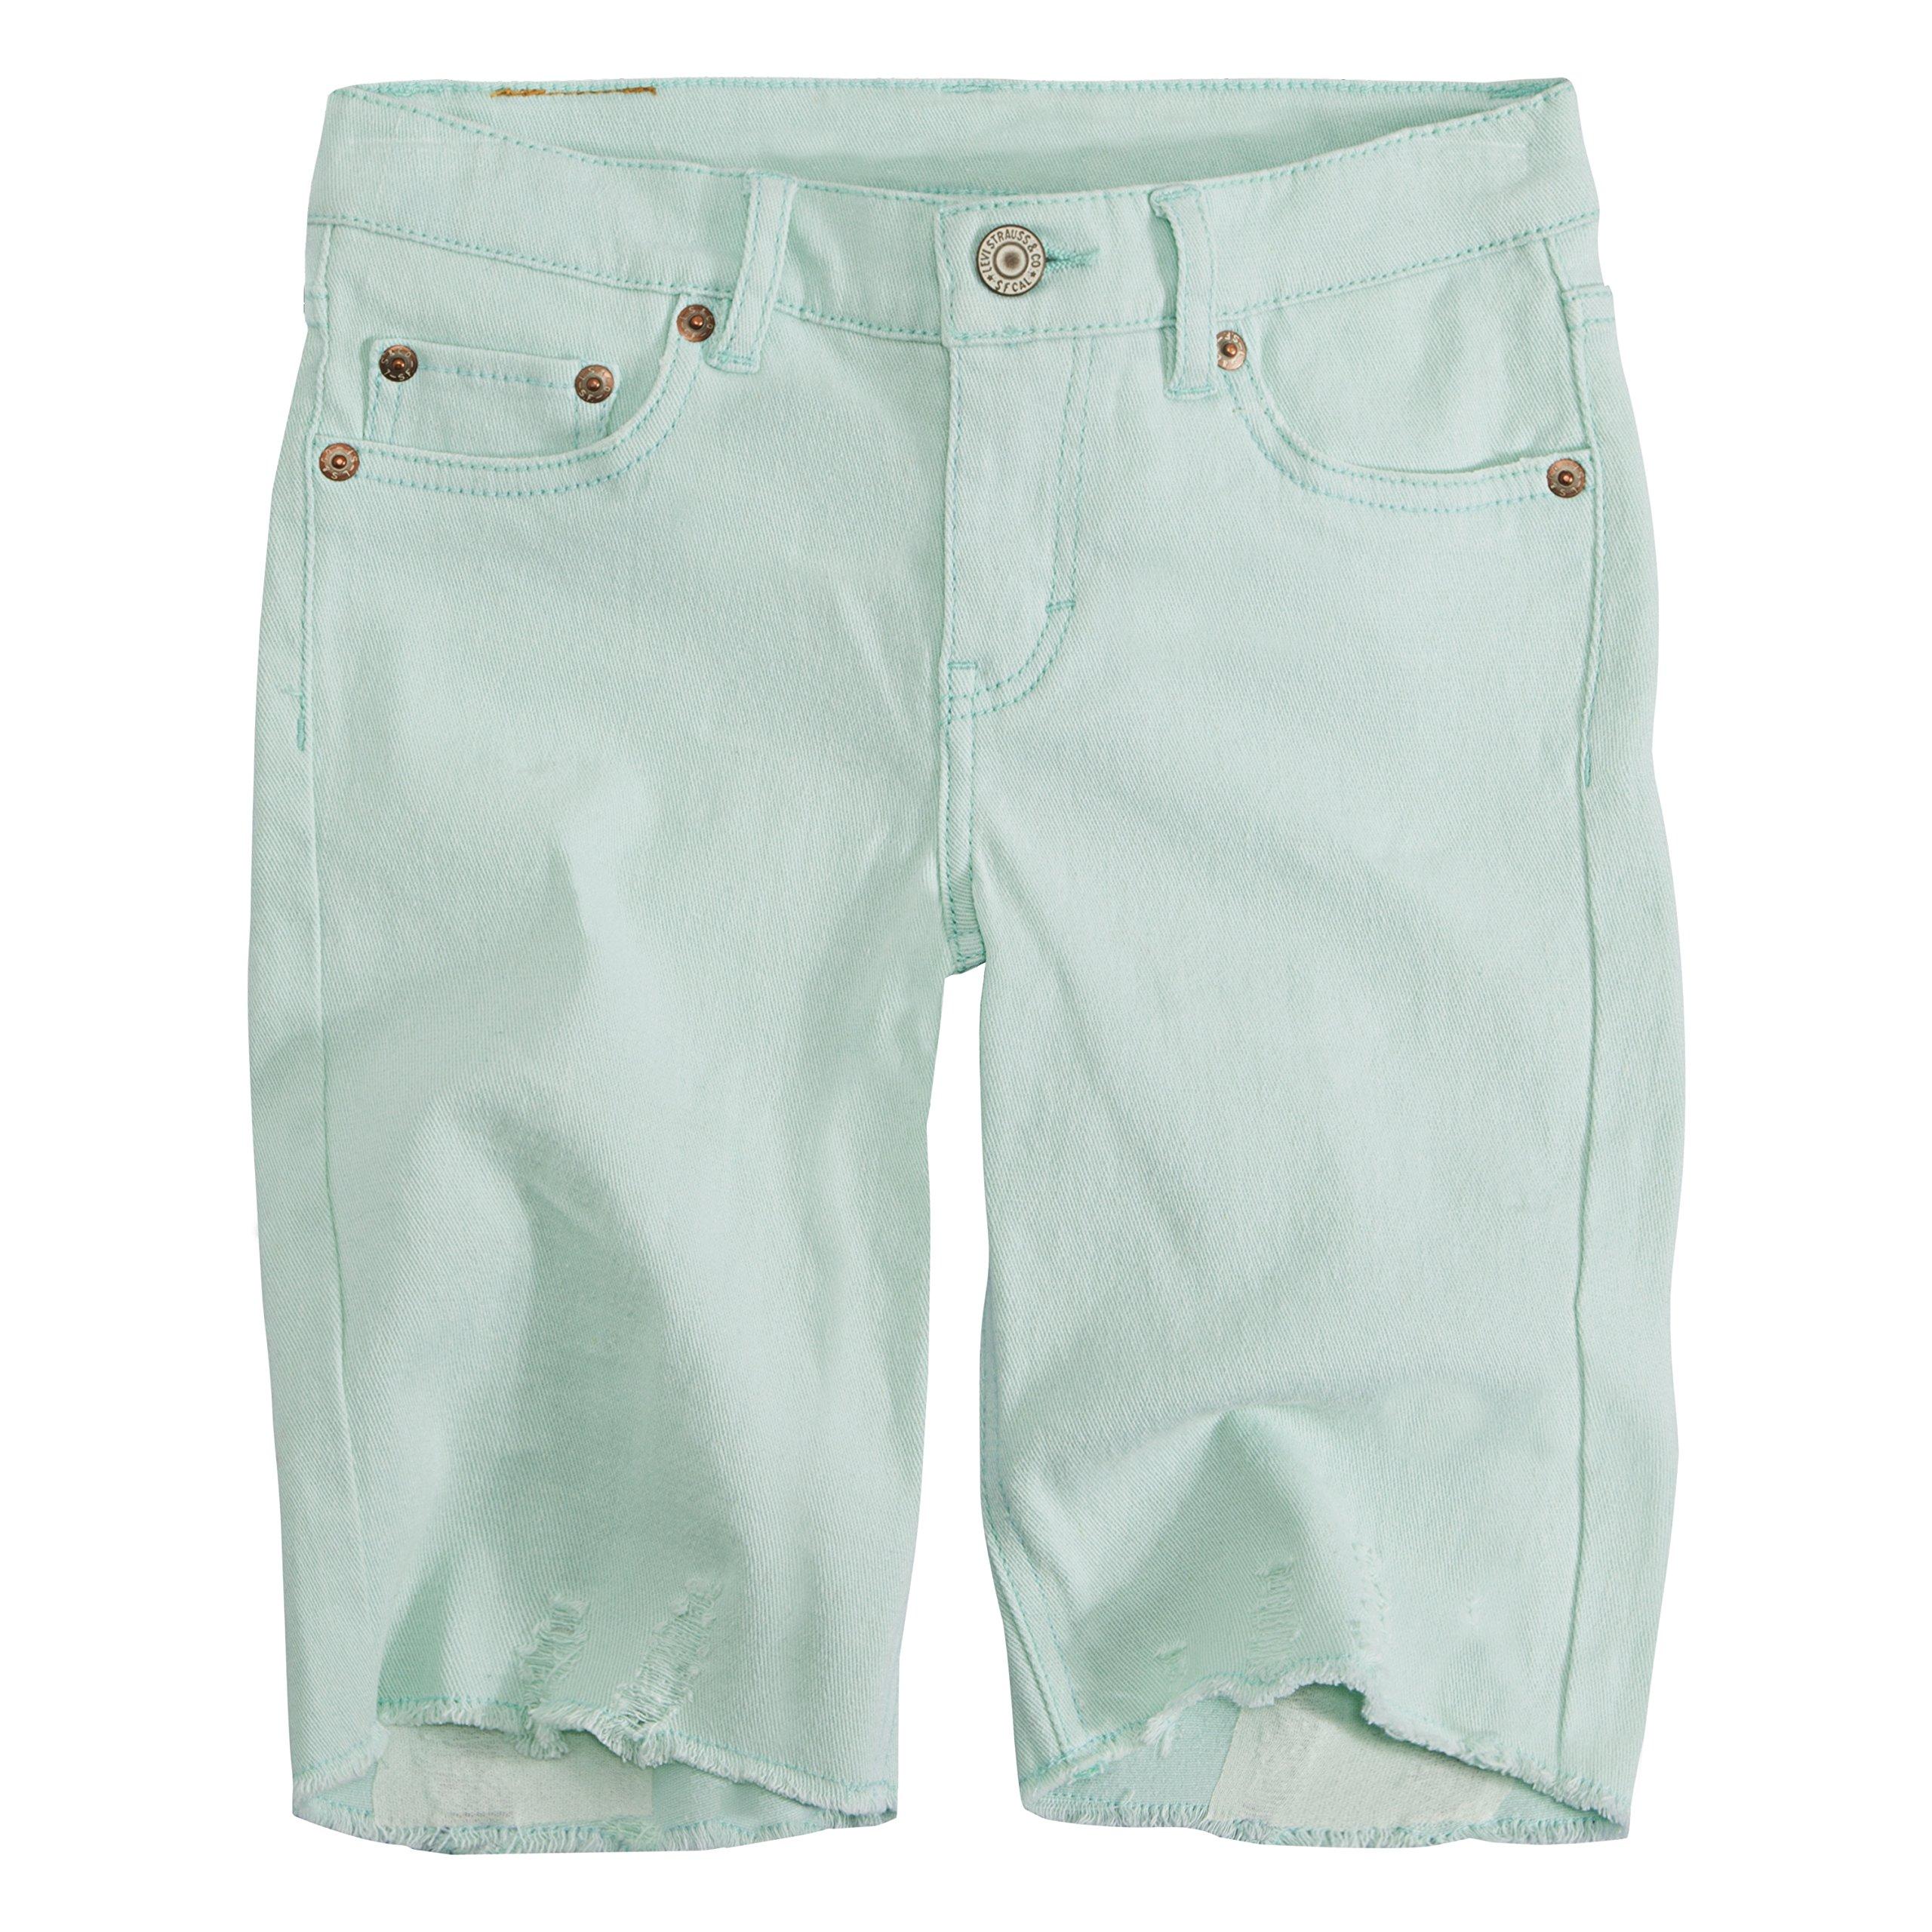 Levi's Big Girls' Denim Bermuda Shorts, Fair Aqua, 10